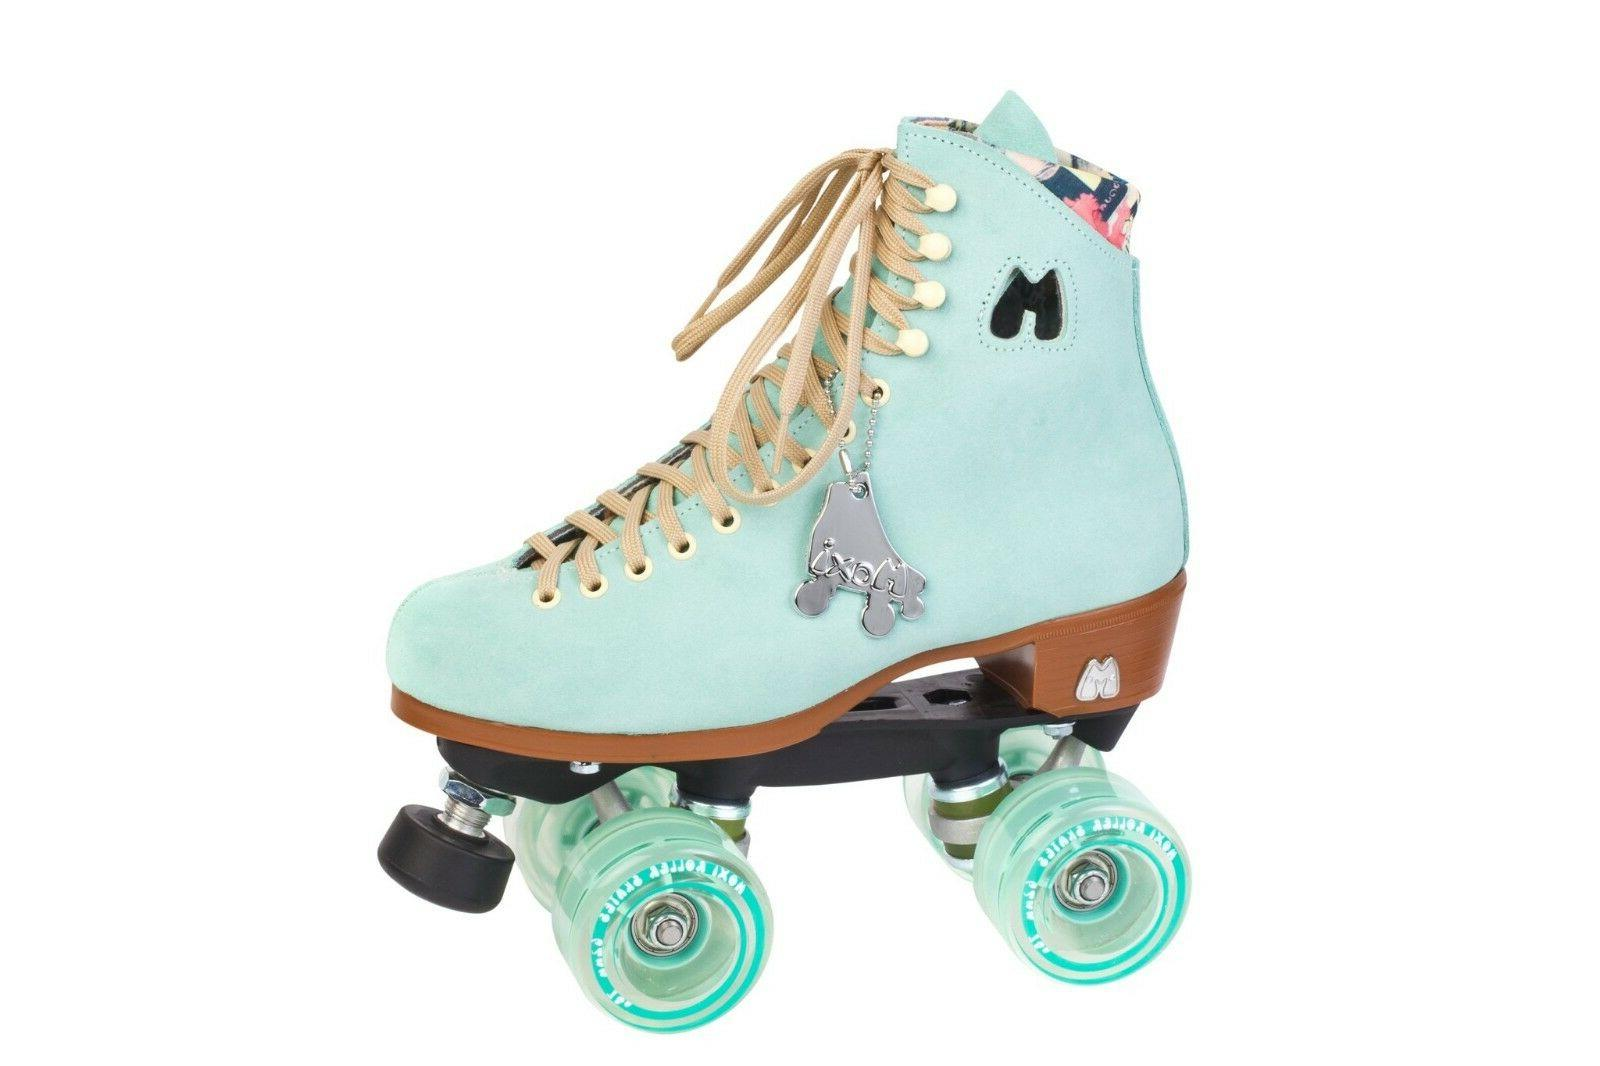 lolly roller skates floss teal suede